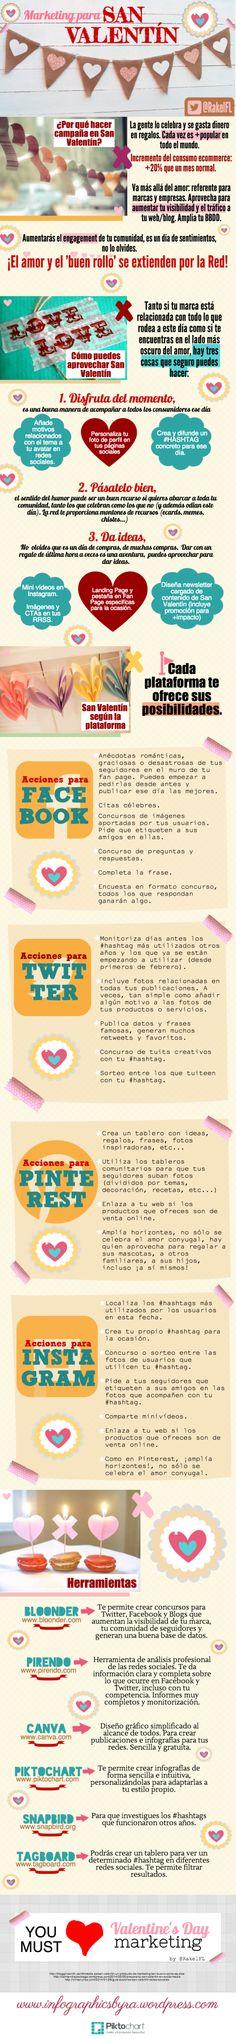 Marketing para San Valentín #infografia